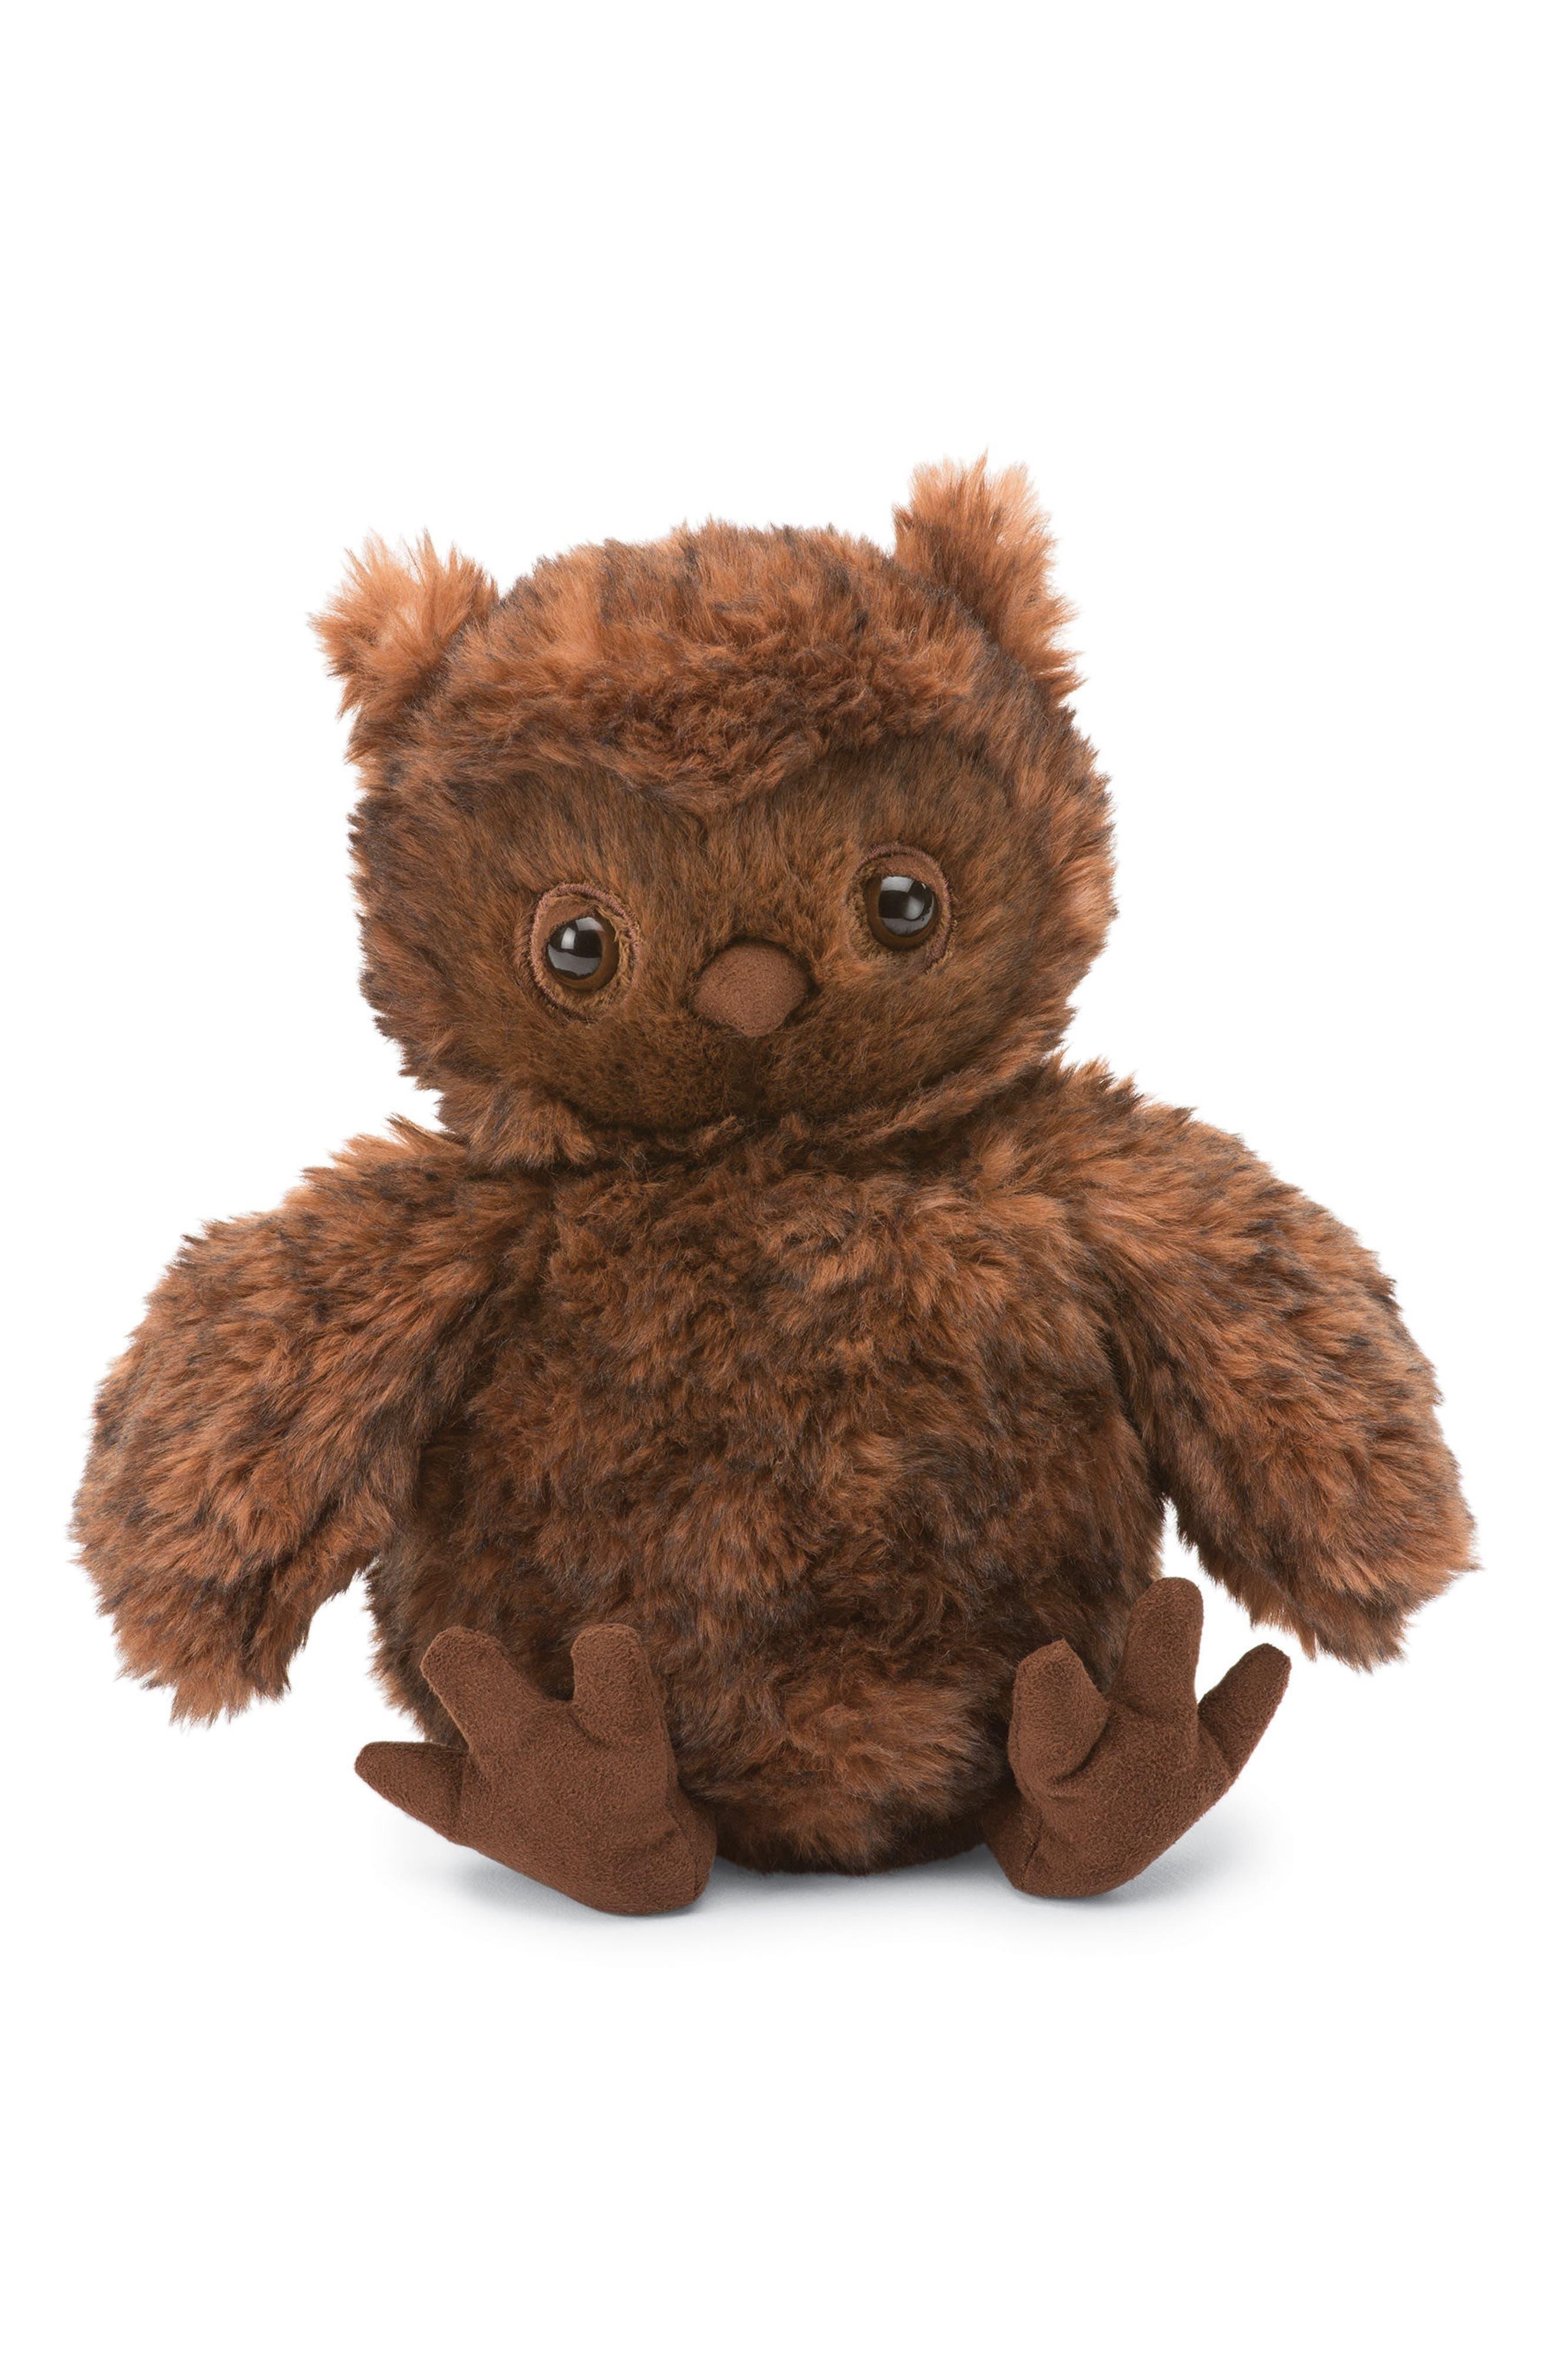 Main Image - Jellycat Cornelius the Owl Stuffed Animal